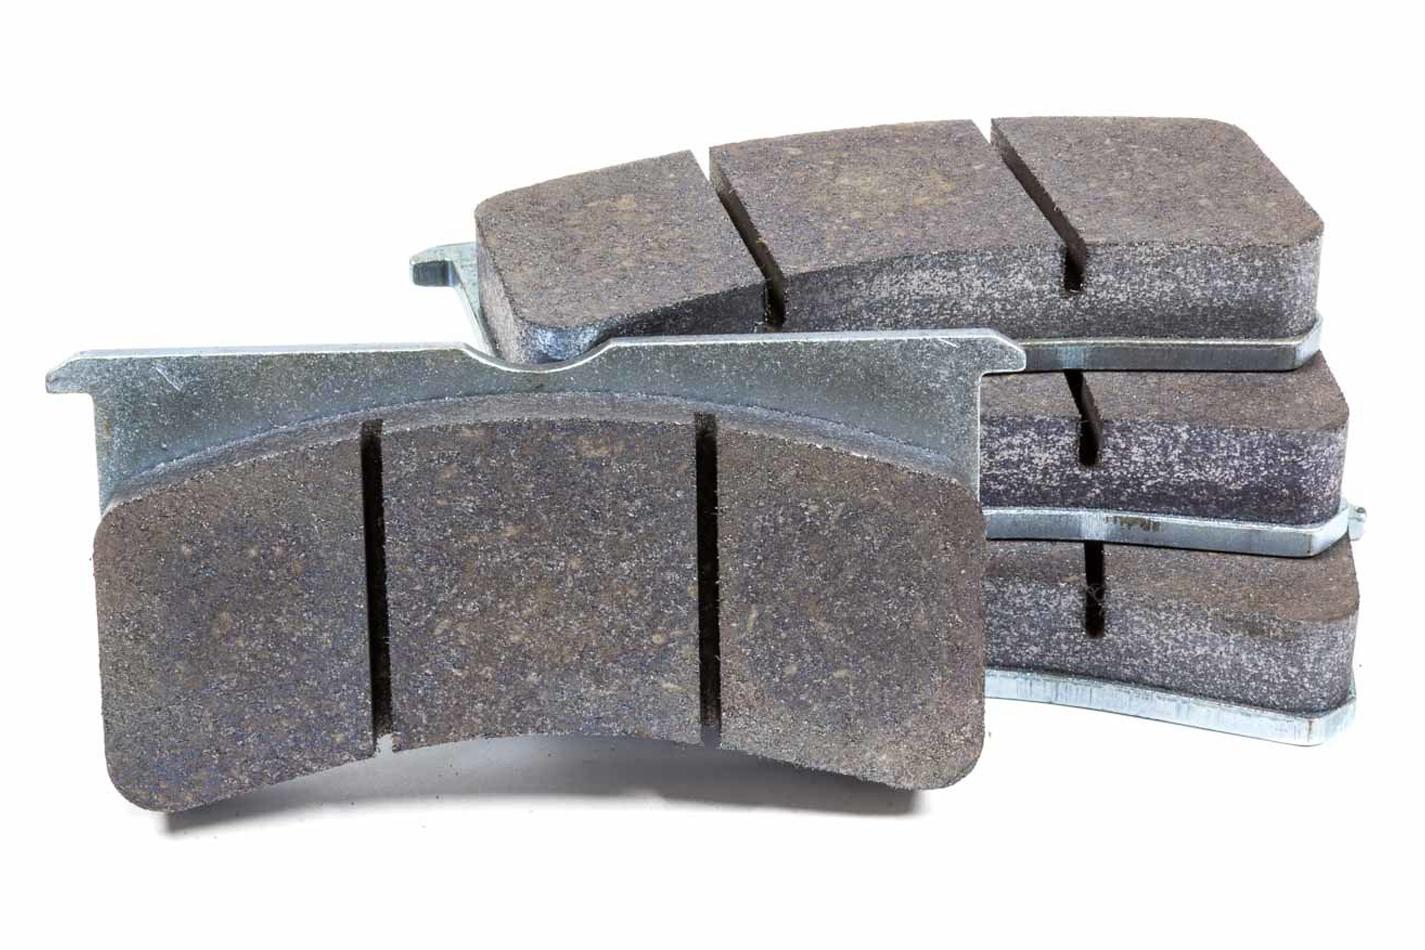 Wilwood 150-14773K Brake Pads, BP-30 Compound, Very High Friction, High Temperature, Superlite Caliper, Kit